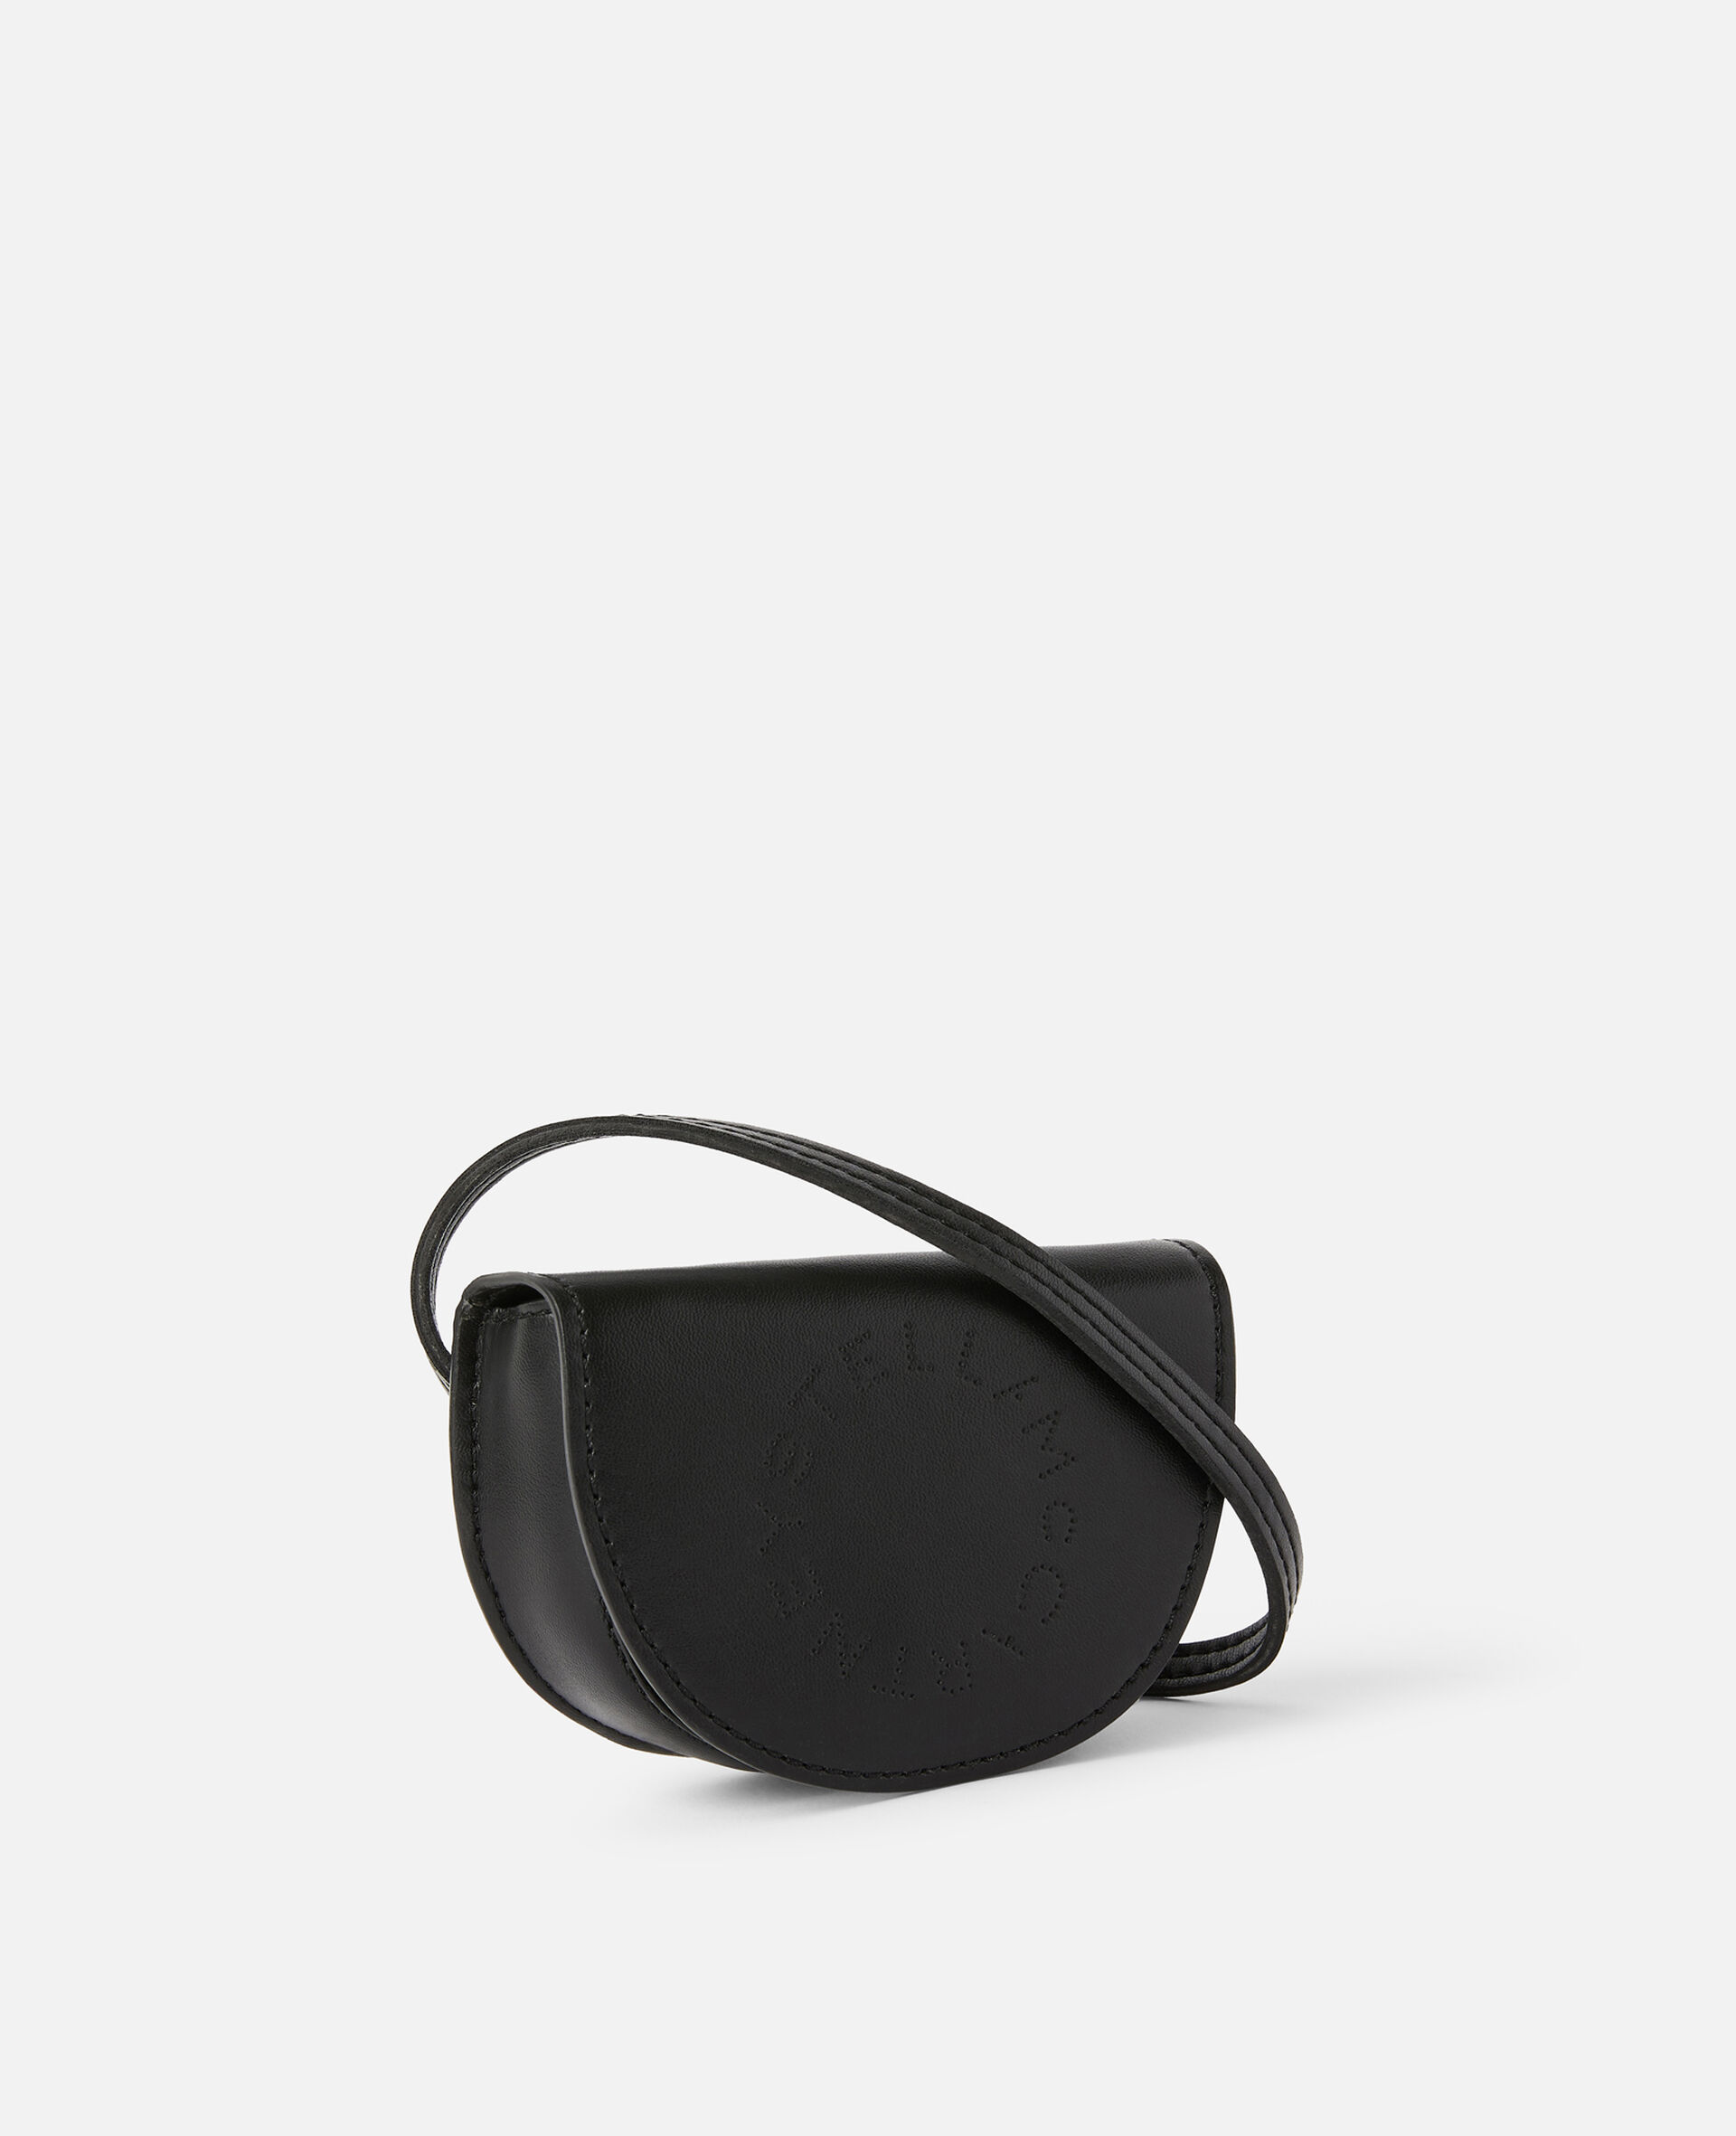 Sac ceinture Marlee miniature-Noir-large image number 1